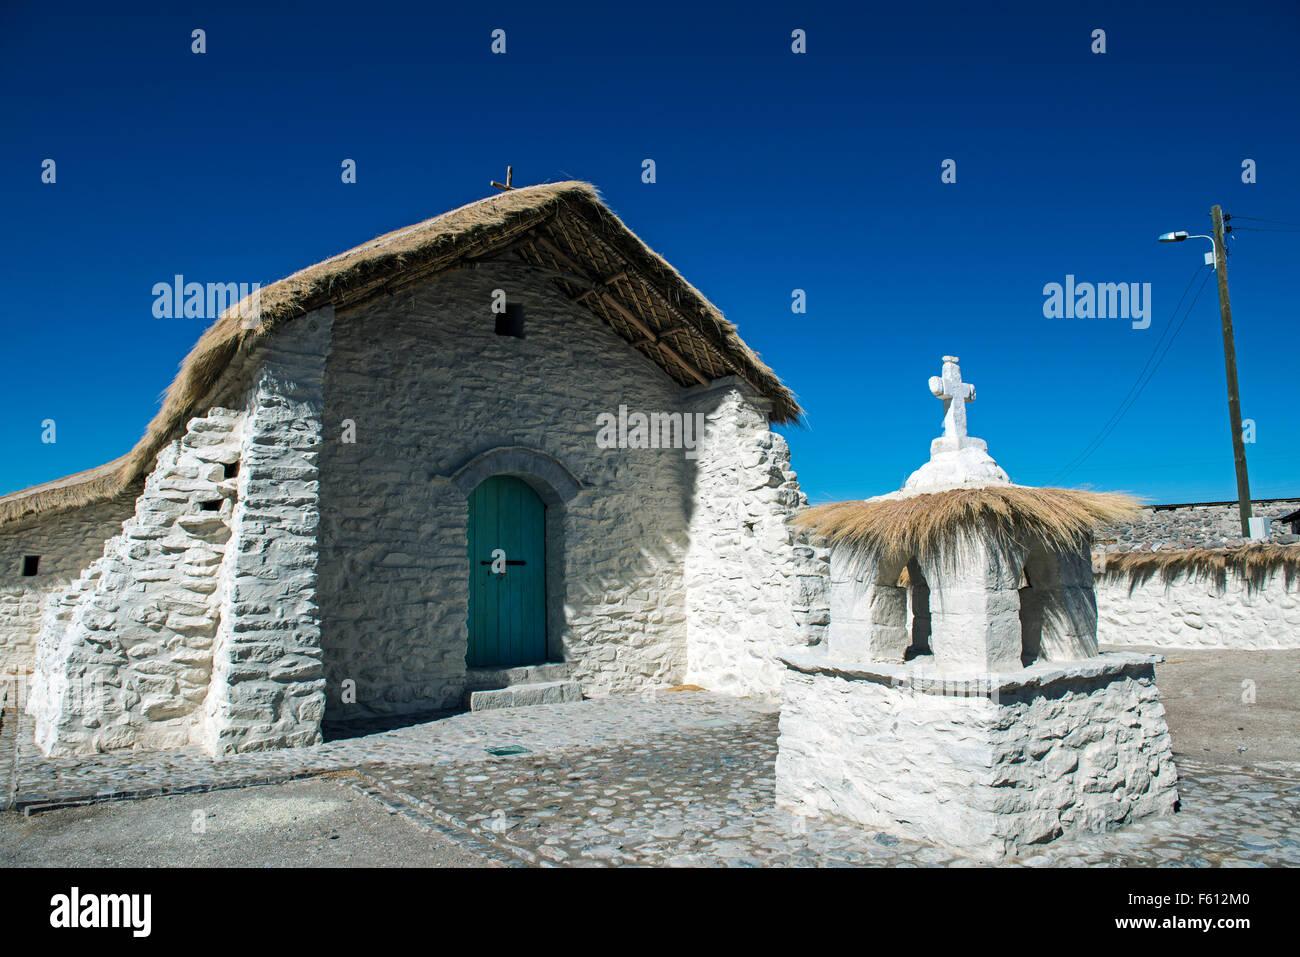 Church in village, 19th century Andean Baroque style, Guallatire, Region Arica y Parinacota, Northern Chile, Chile - Stock Image